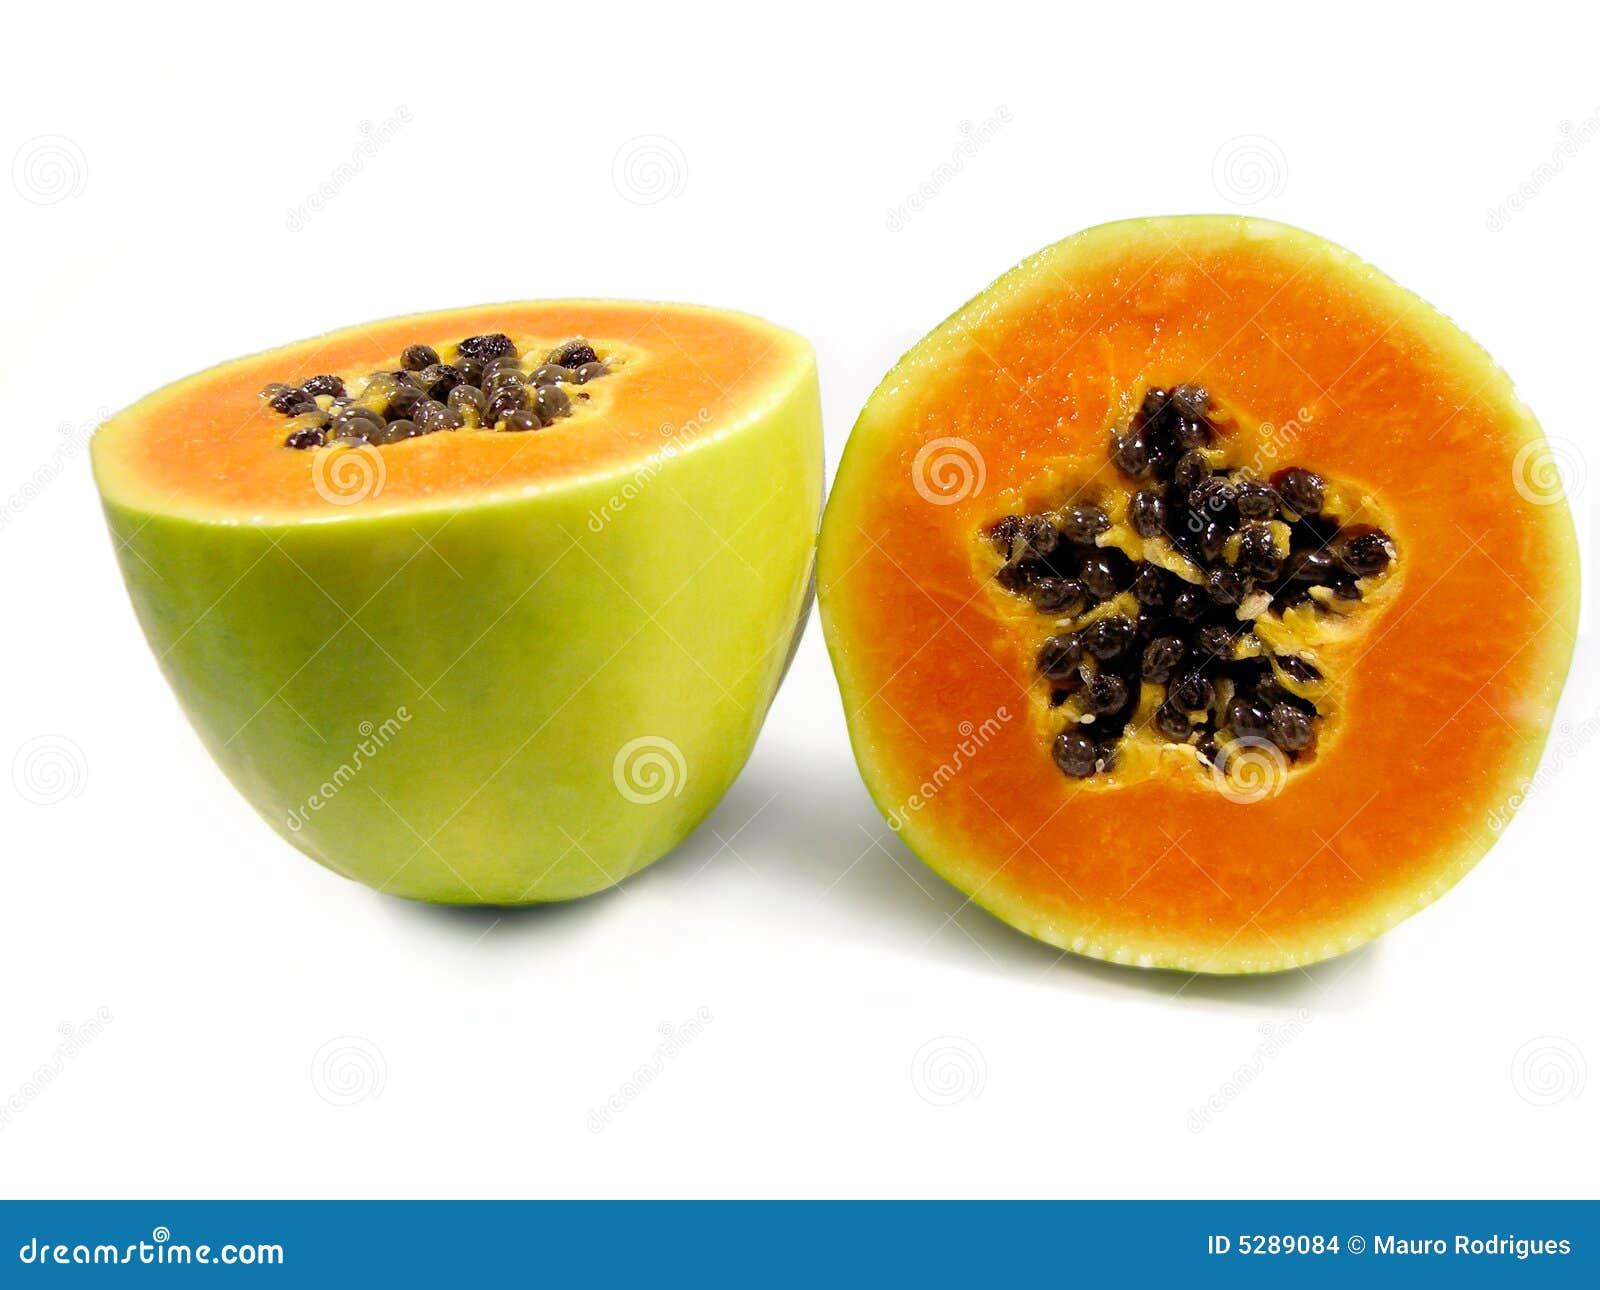 Papaya Fruit Cut In Half Stock Images - Image: 5289084